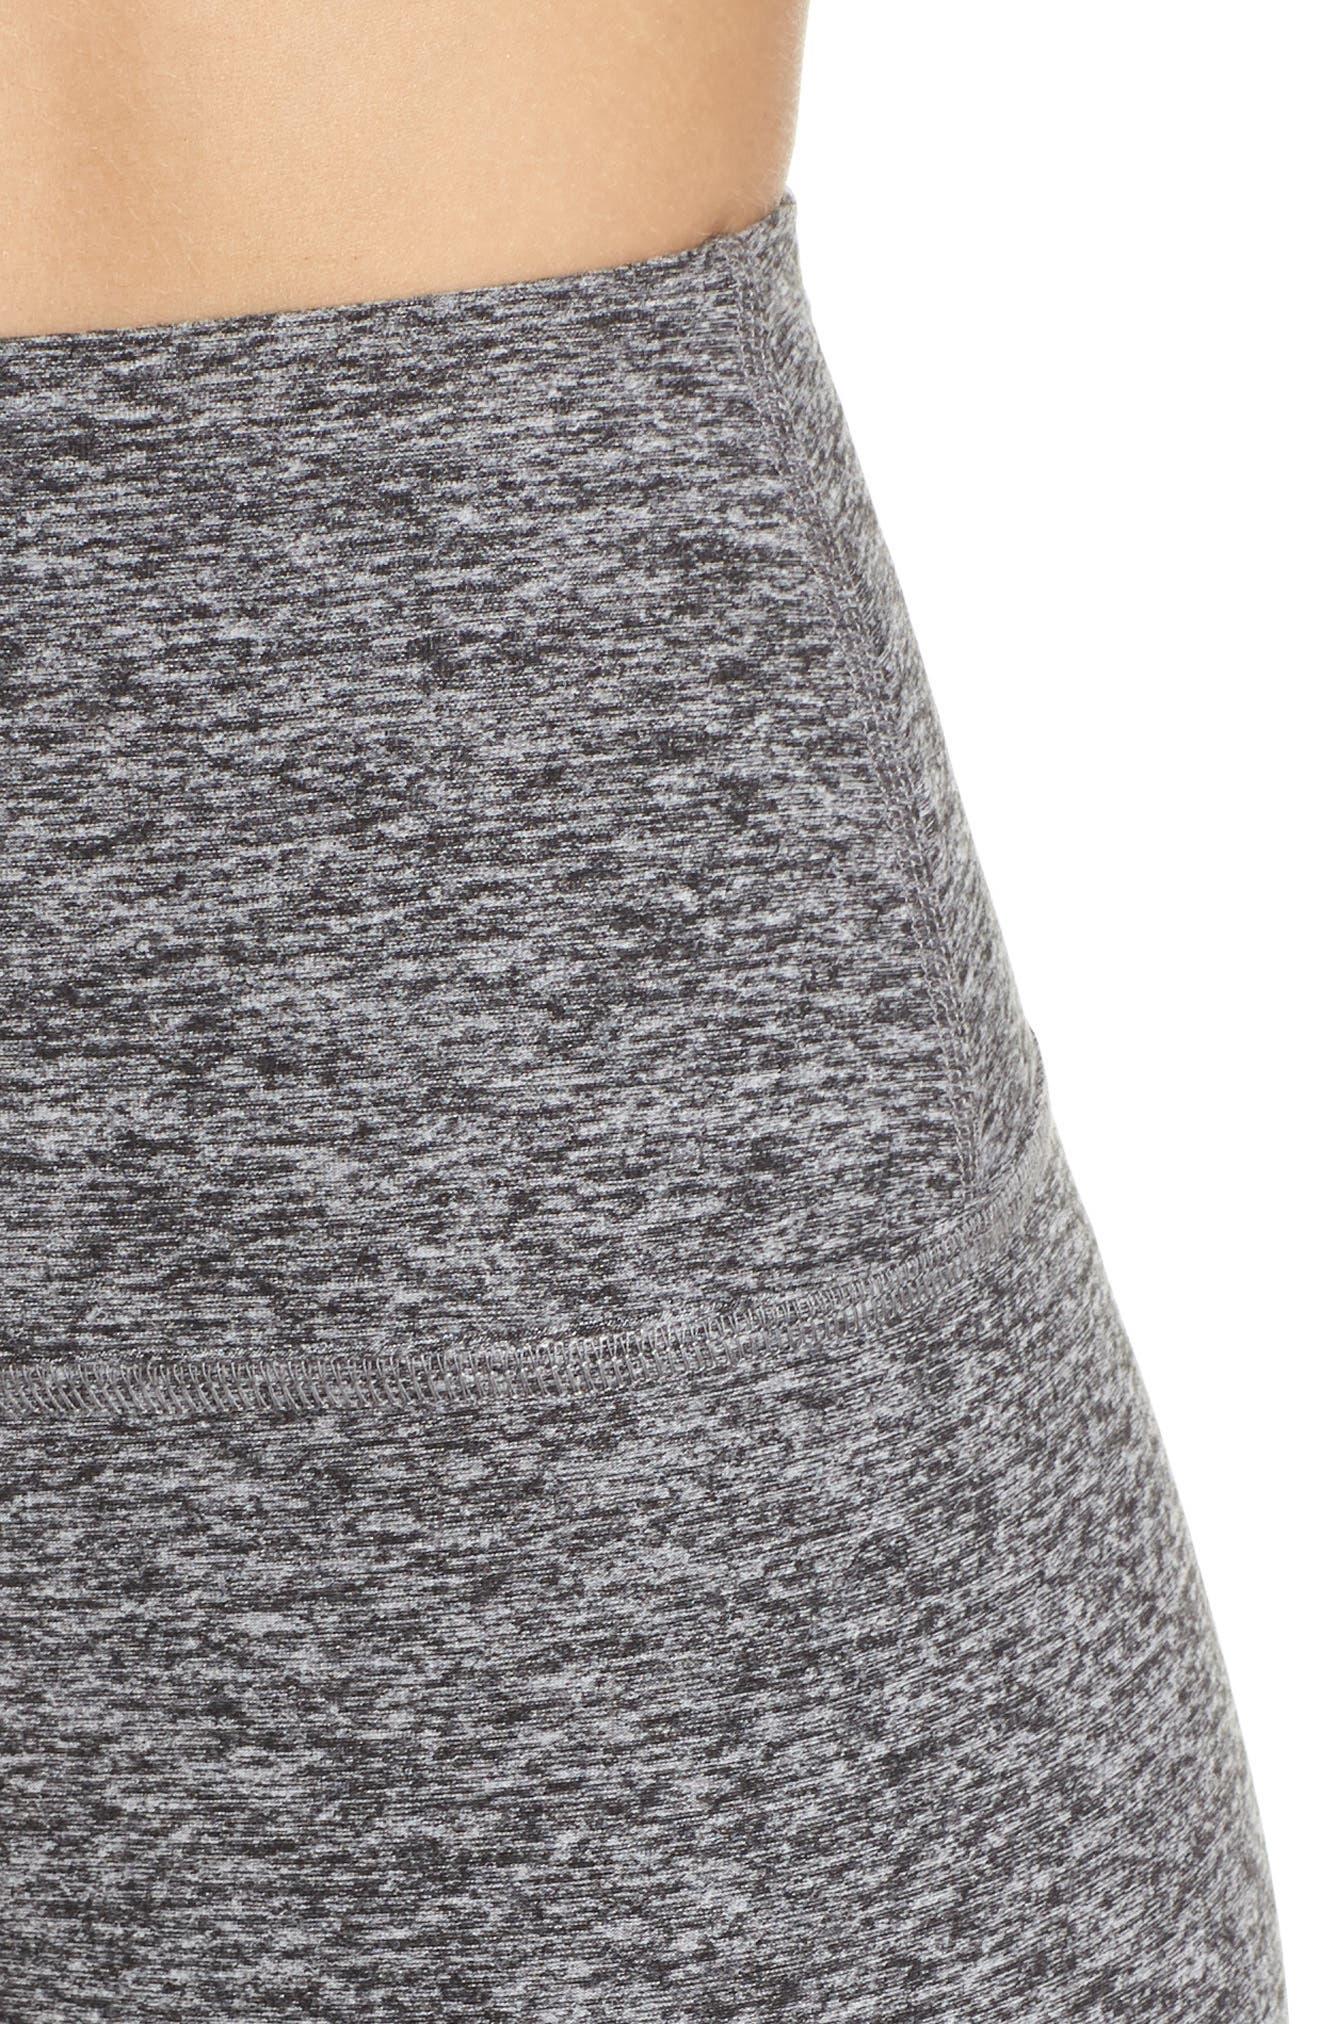 Midi High Waist Leggings,                             Alternate thumbnail 4, color,                             Black Charcoal